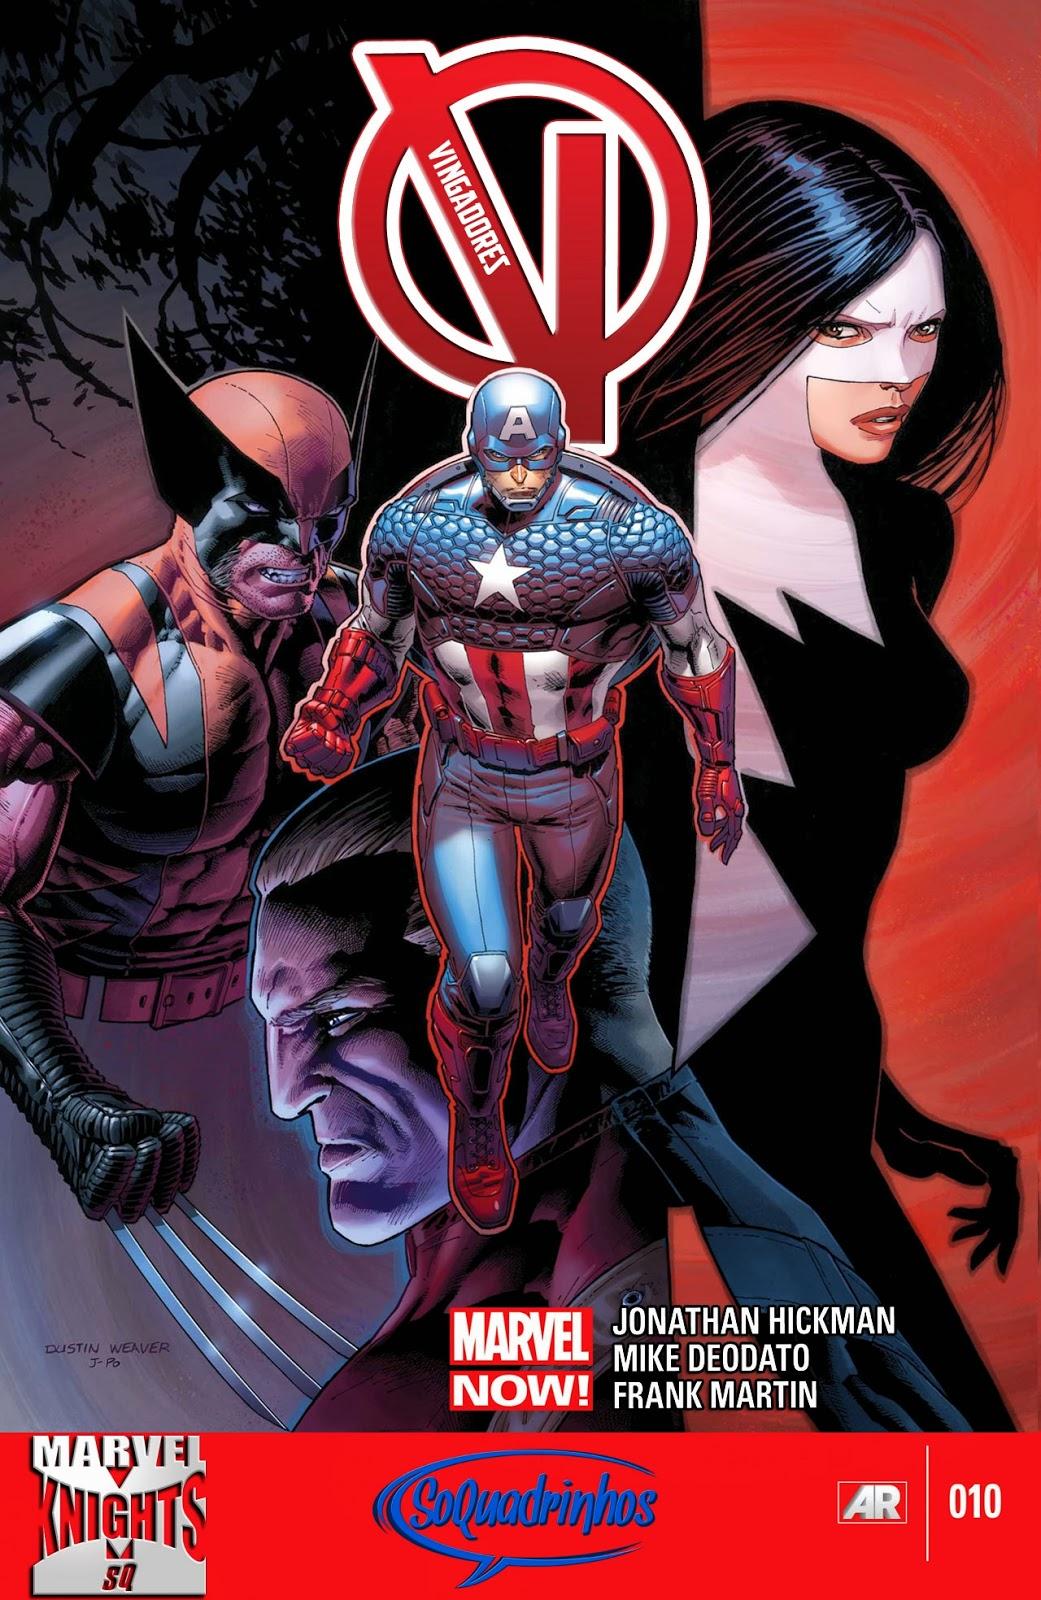 Nova Marvel! Vingadores #10